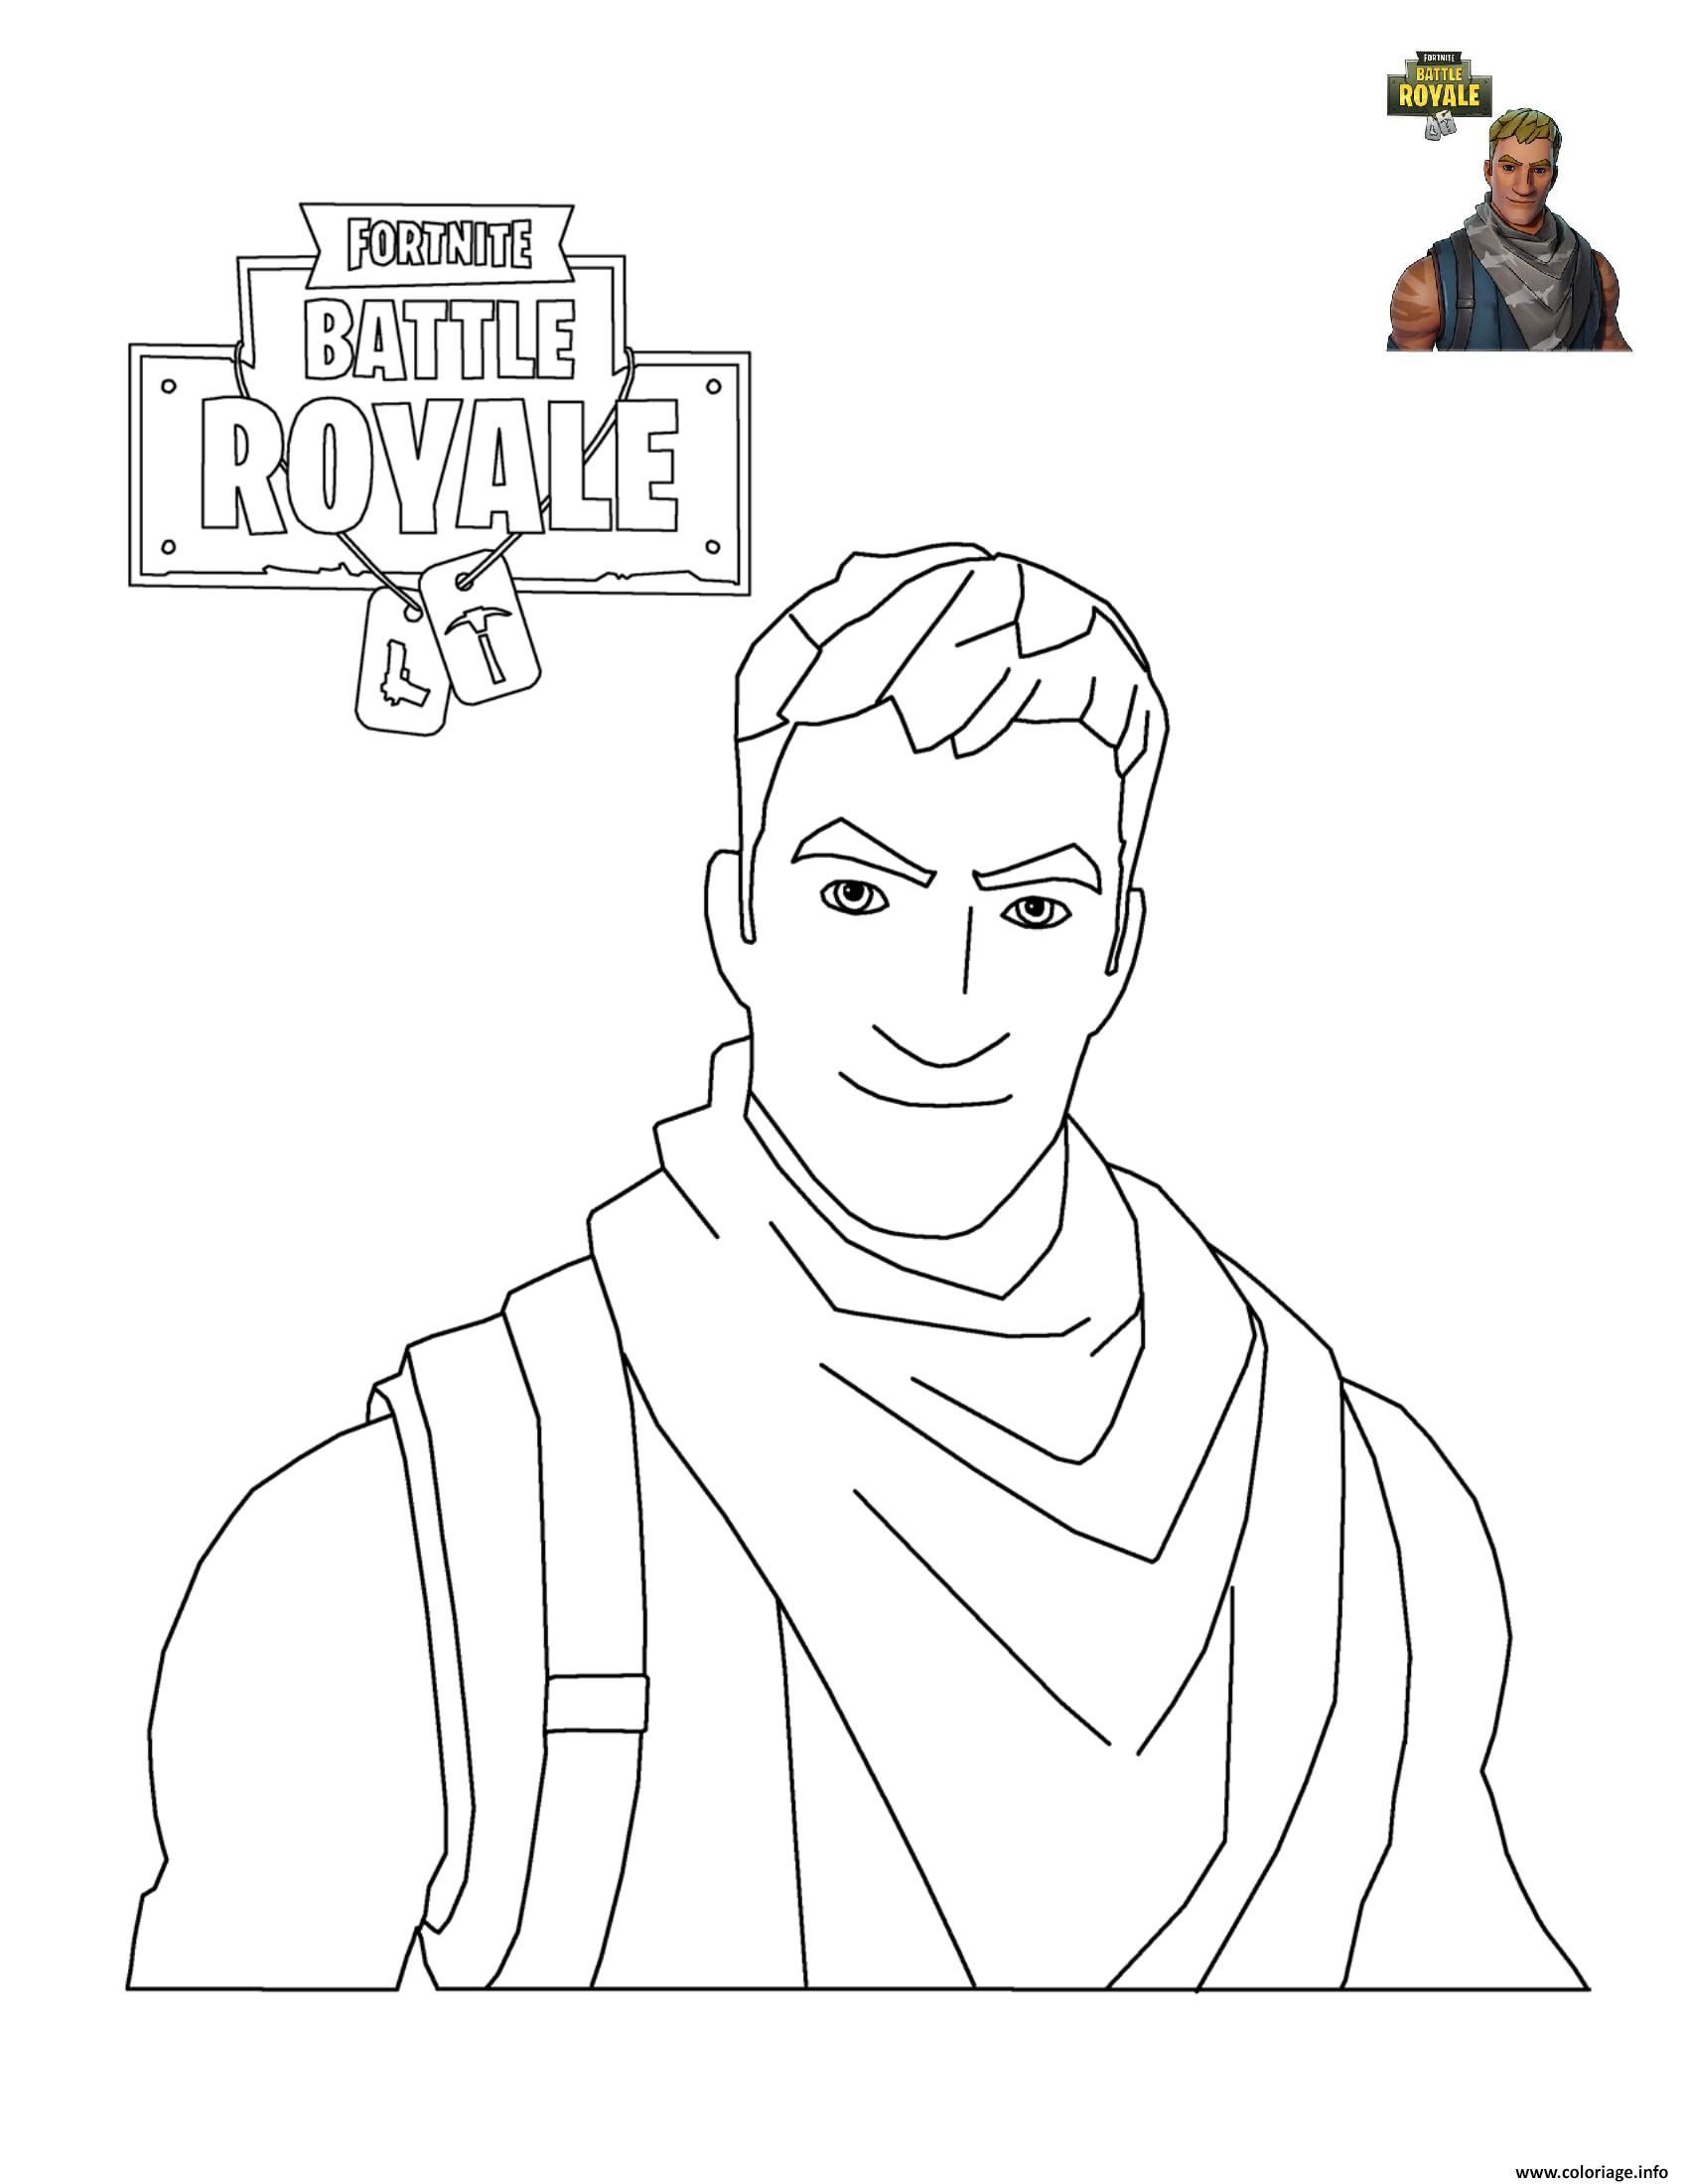 Coloriage Fortnite Battle Royale Personnage 3 Dessin serapportantà Coloriage Fortnite A Imprimer